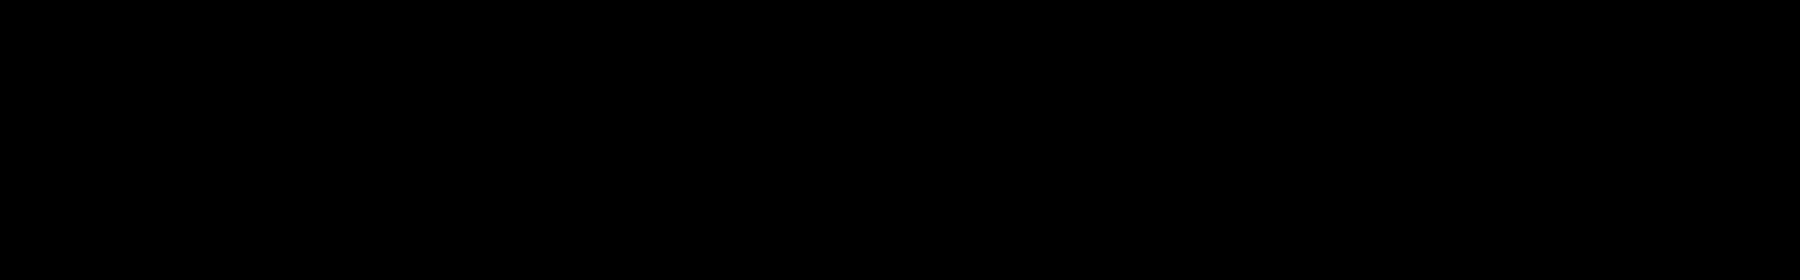 TRAPxTRONICA audio waveform